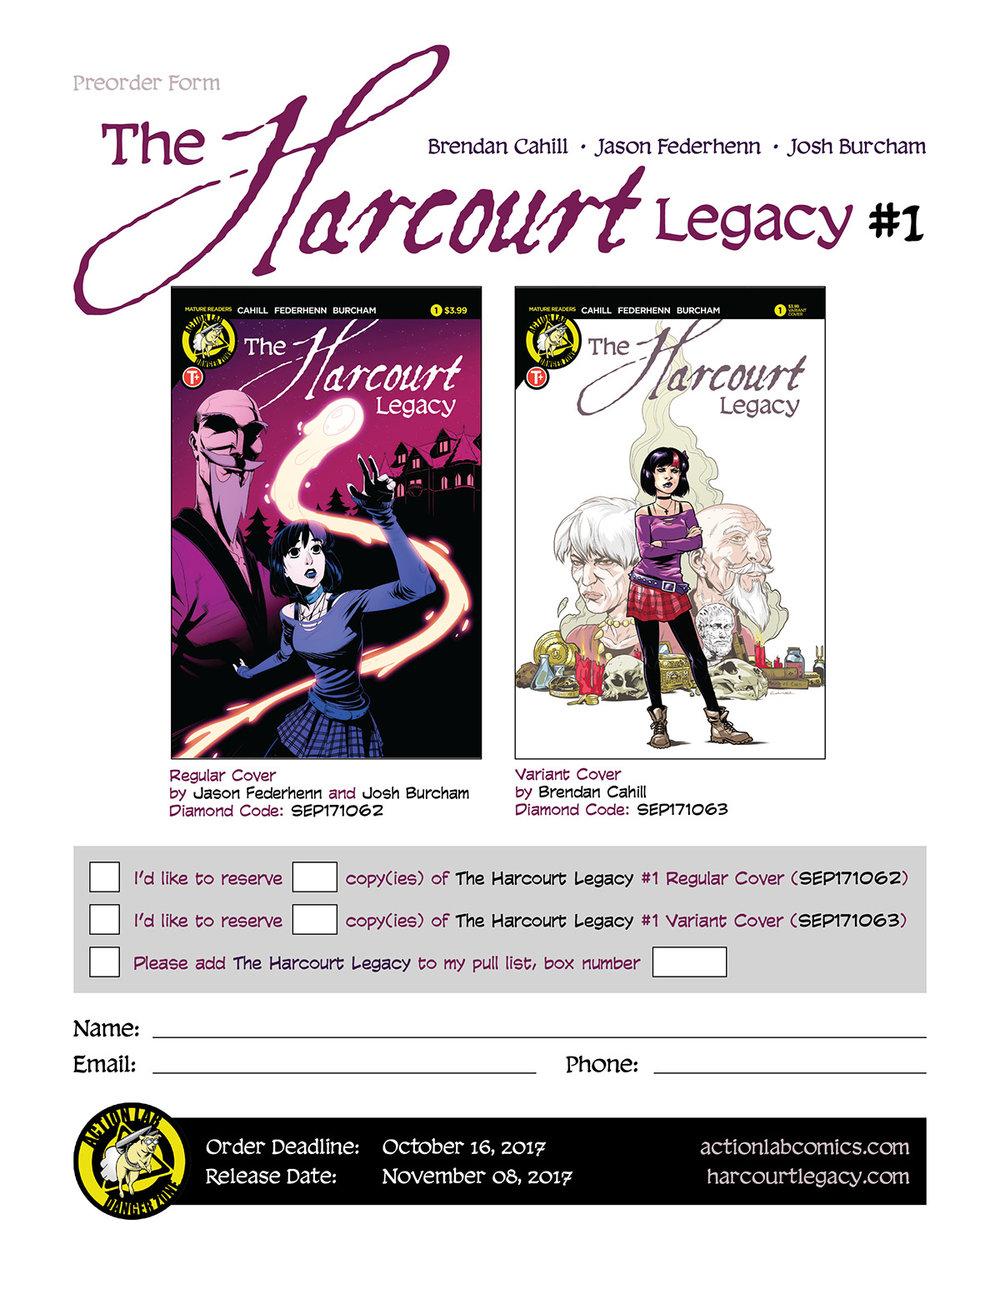 Harcourt_OrderSheet_01.jpg